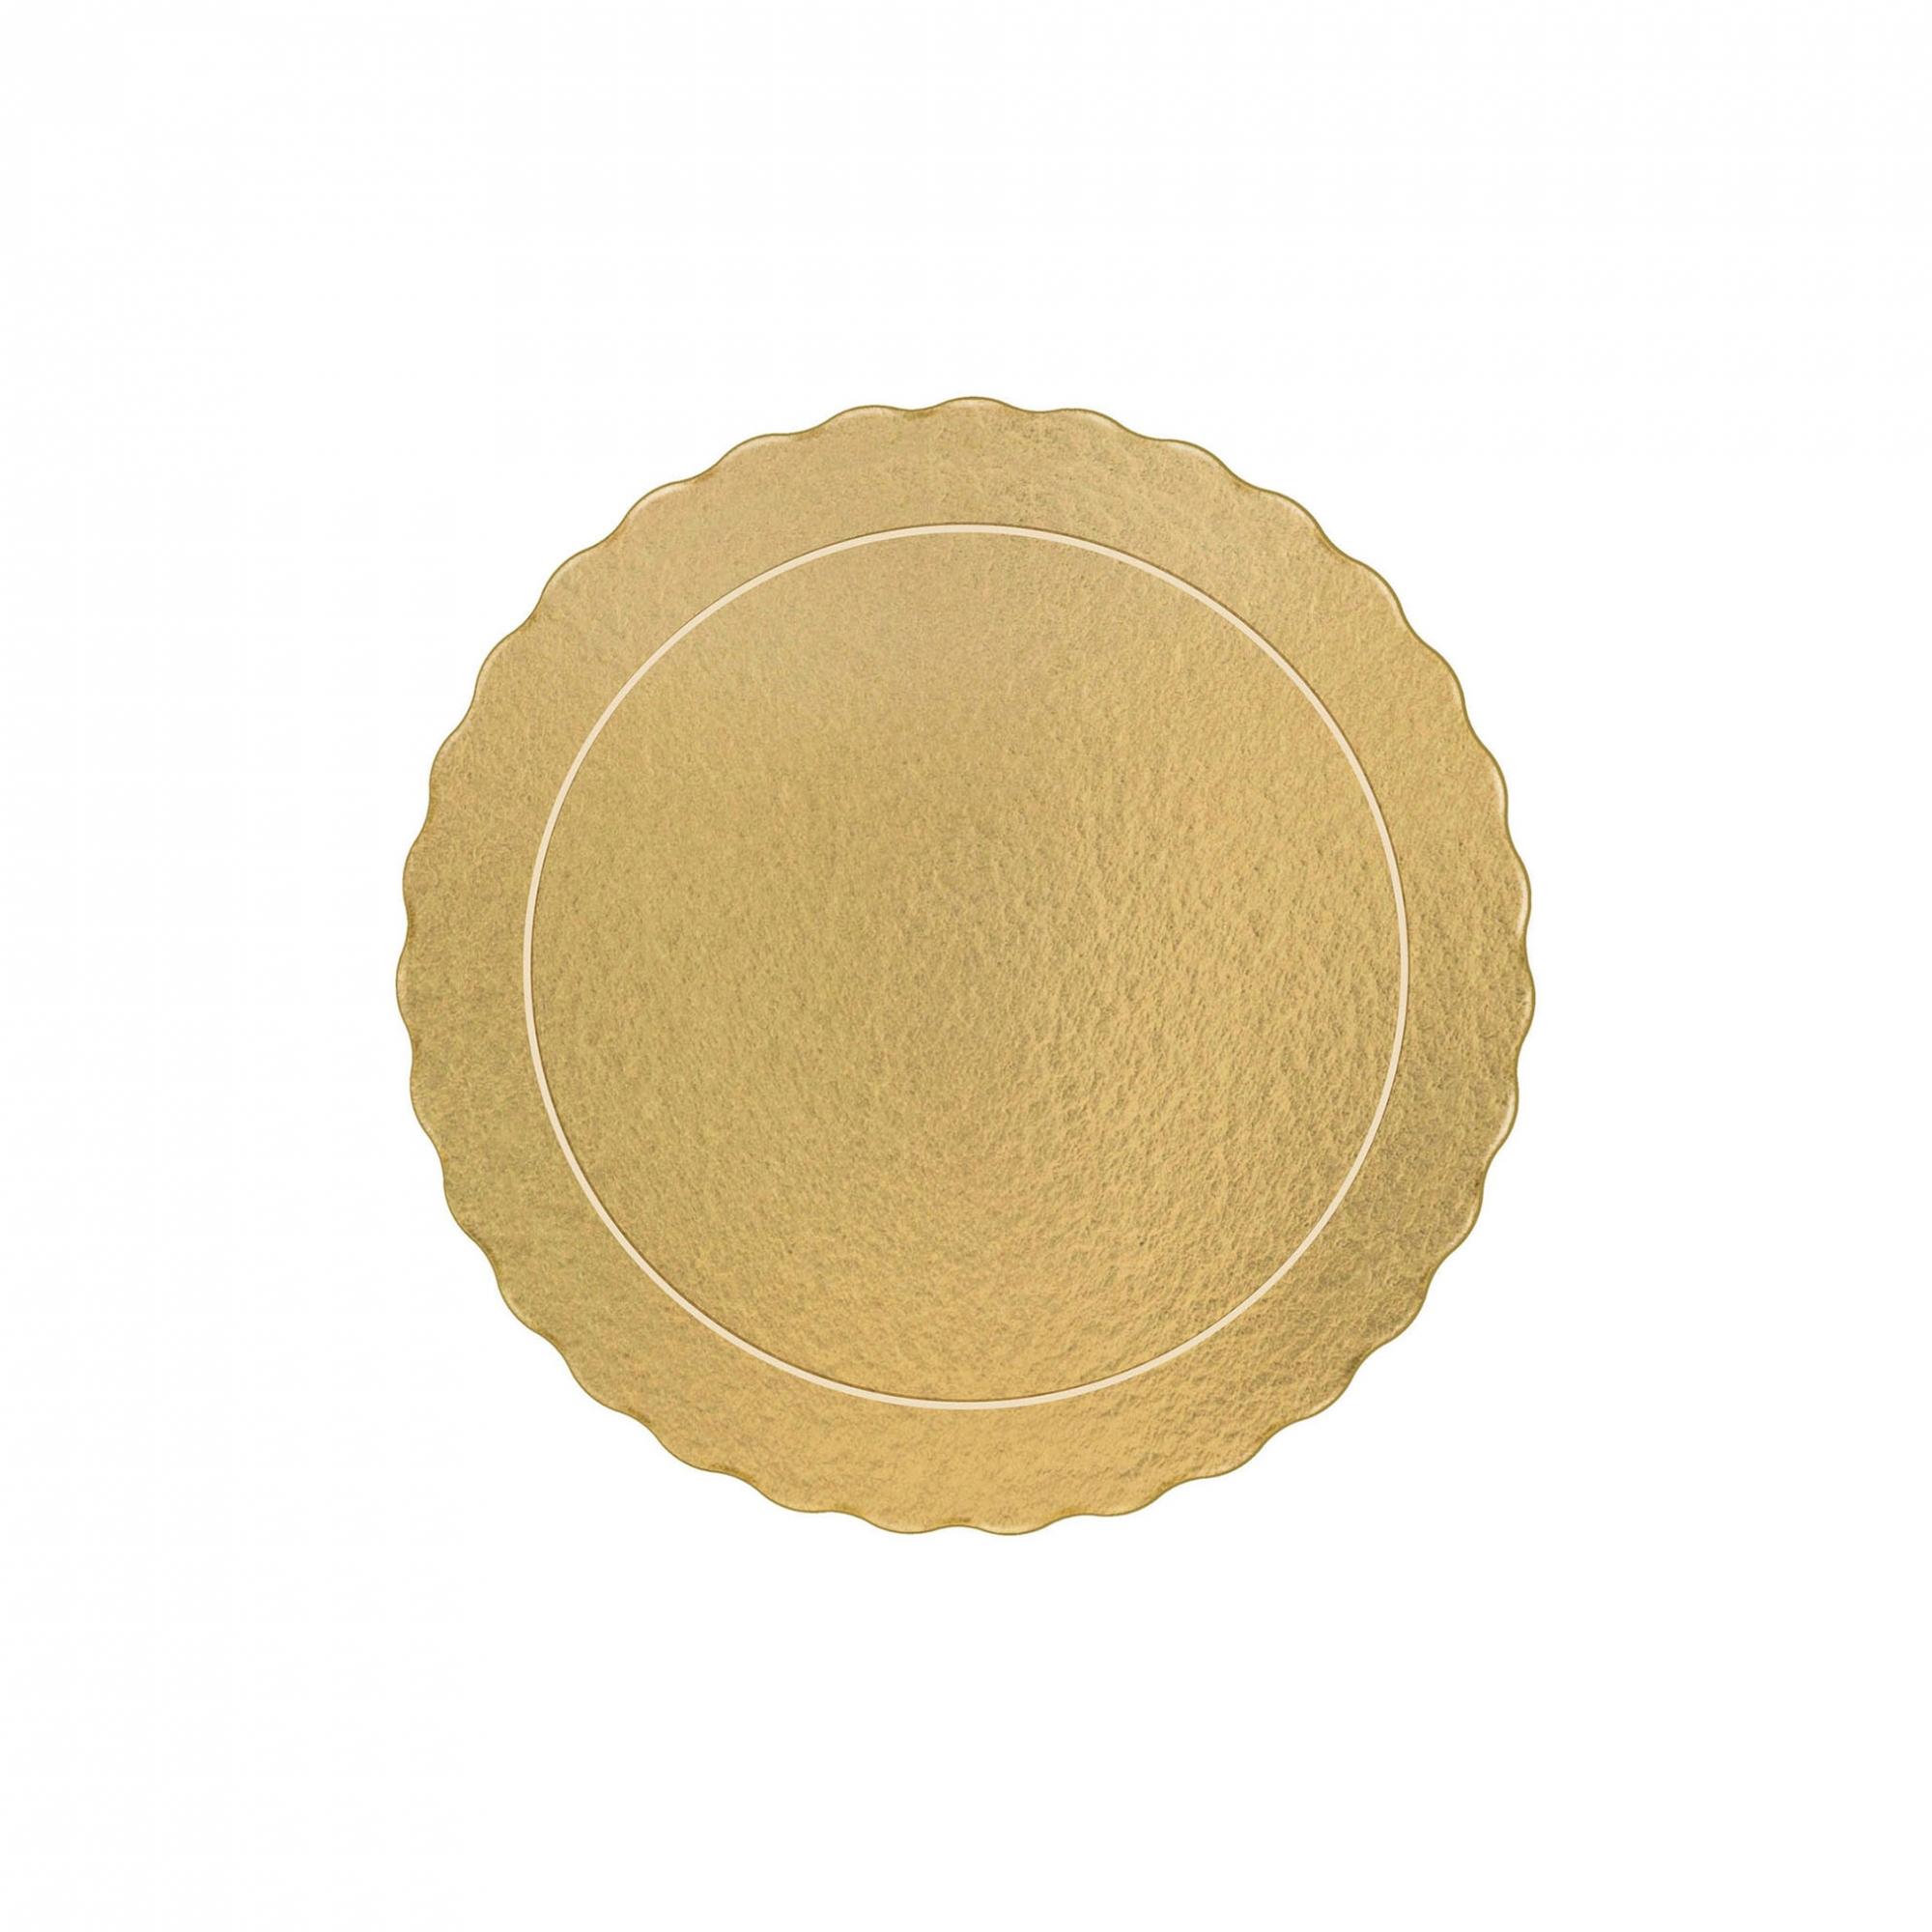 100 Bases Laminadas, Suporte P/ Bolo, Cake Board, 25cm - Ouro